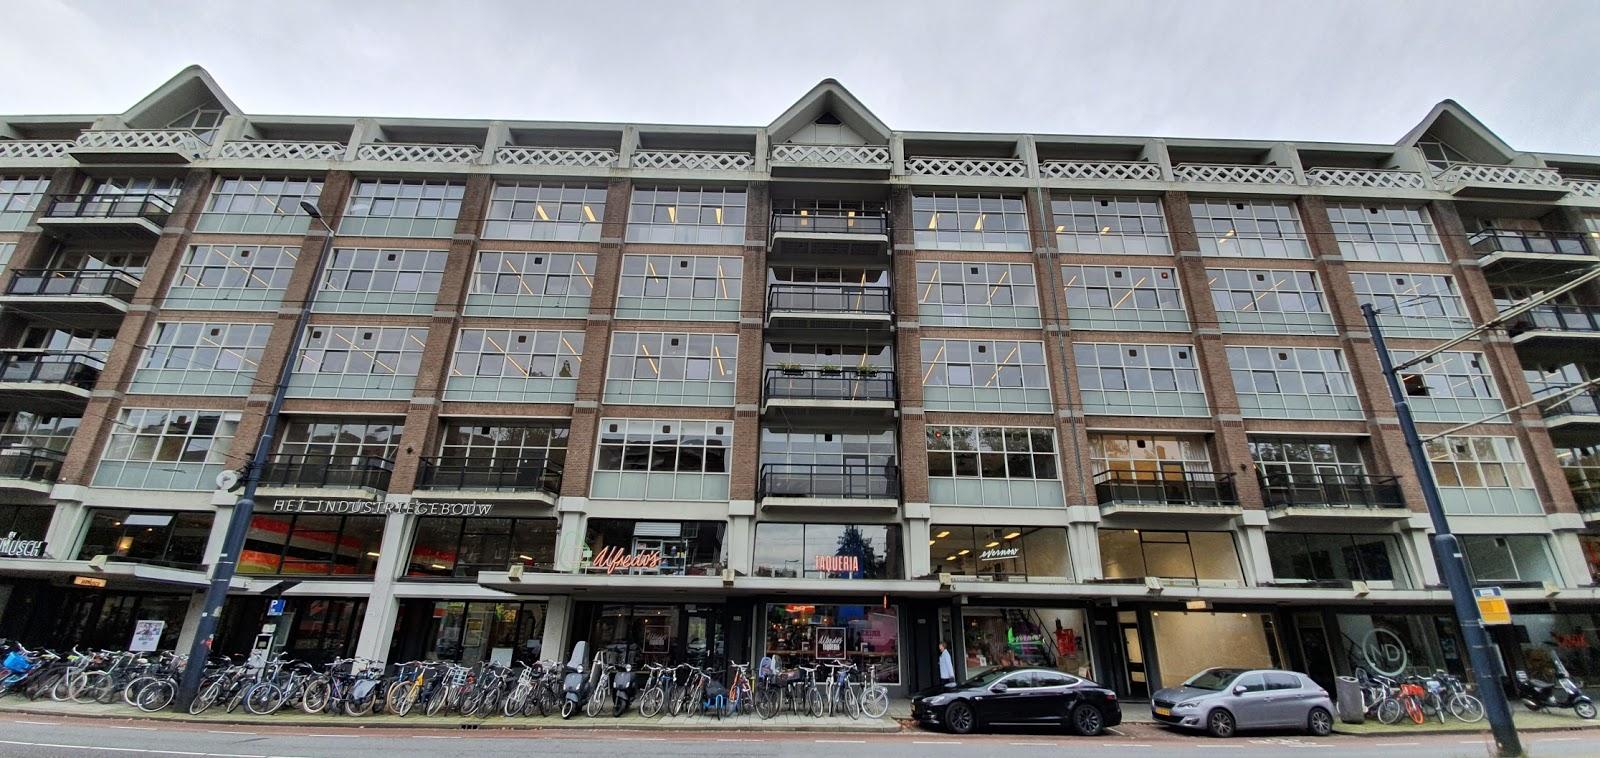 Goudsesingel 204, 3011 KD Rotterdam